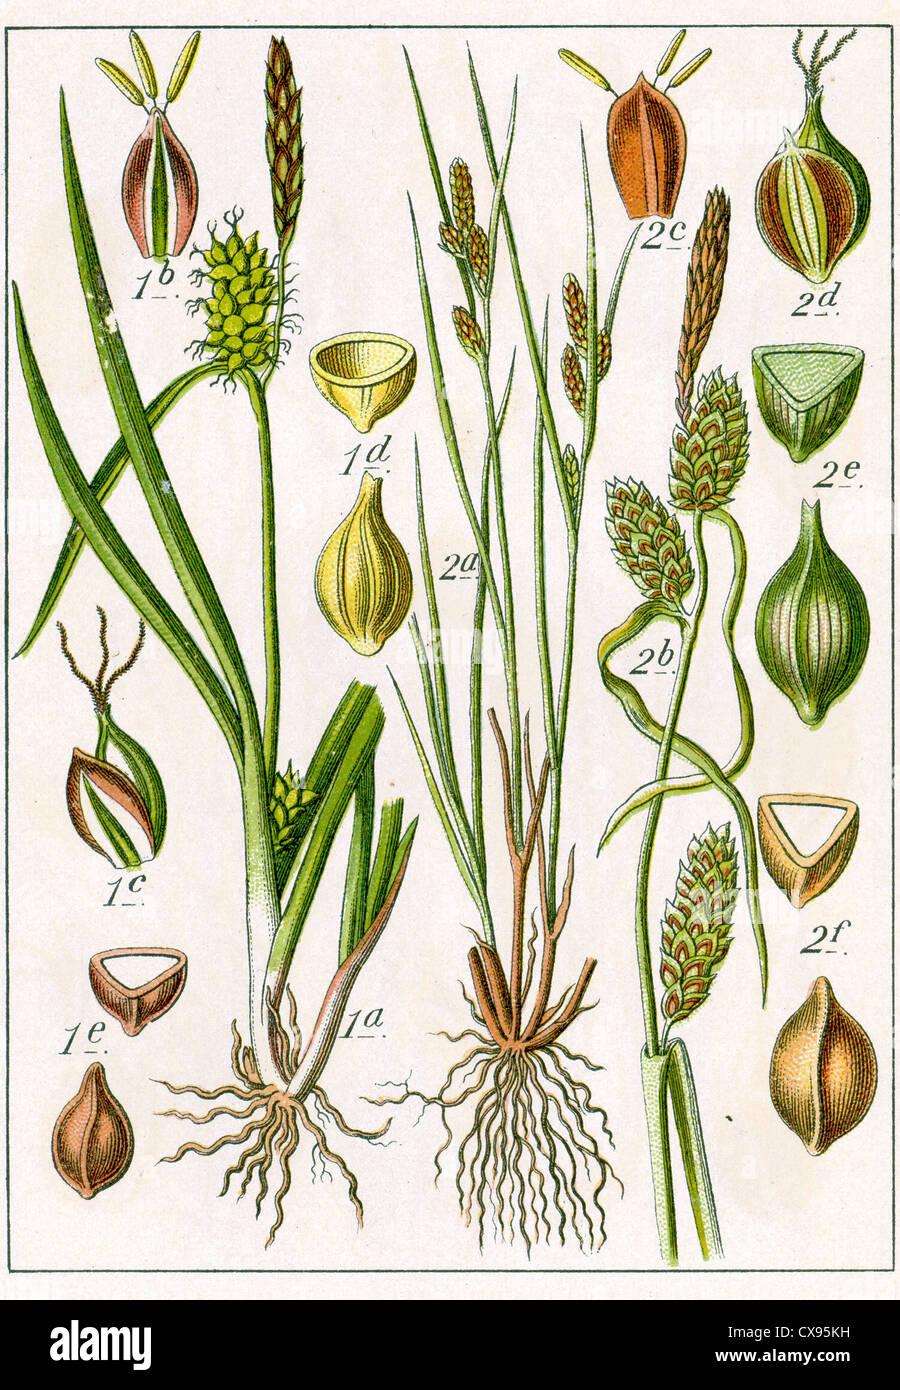 Carex Oederi - Carex extensa - Stock Image